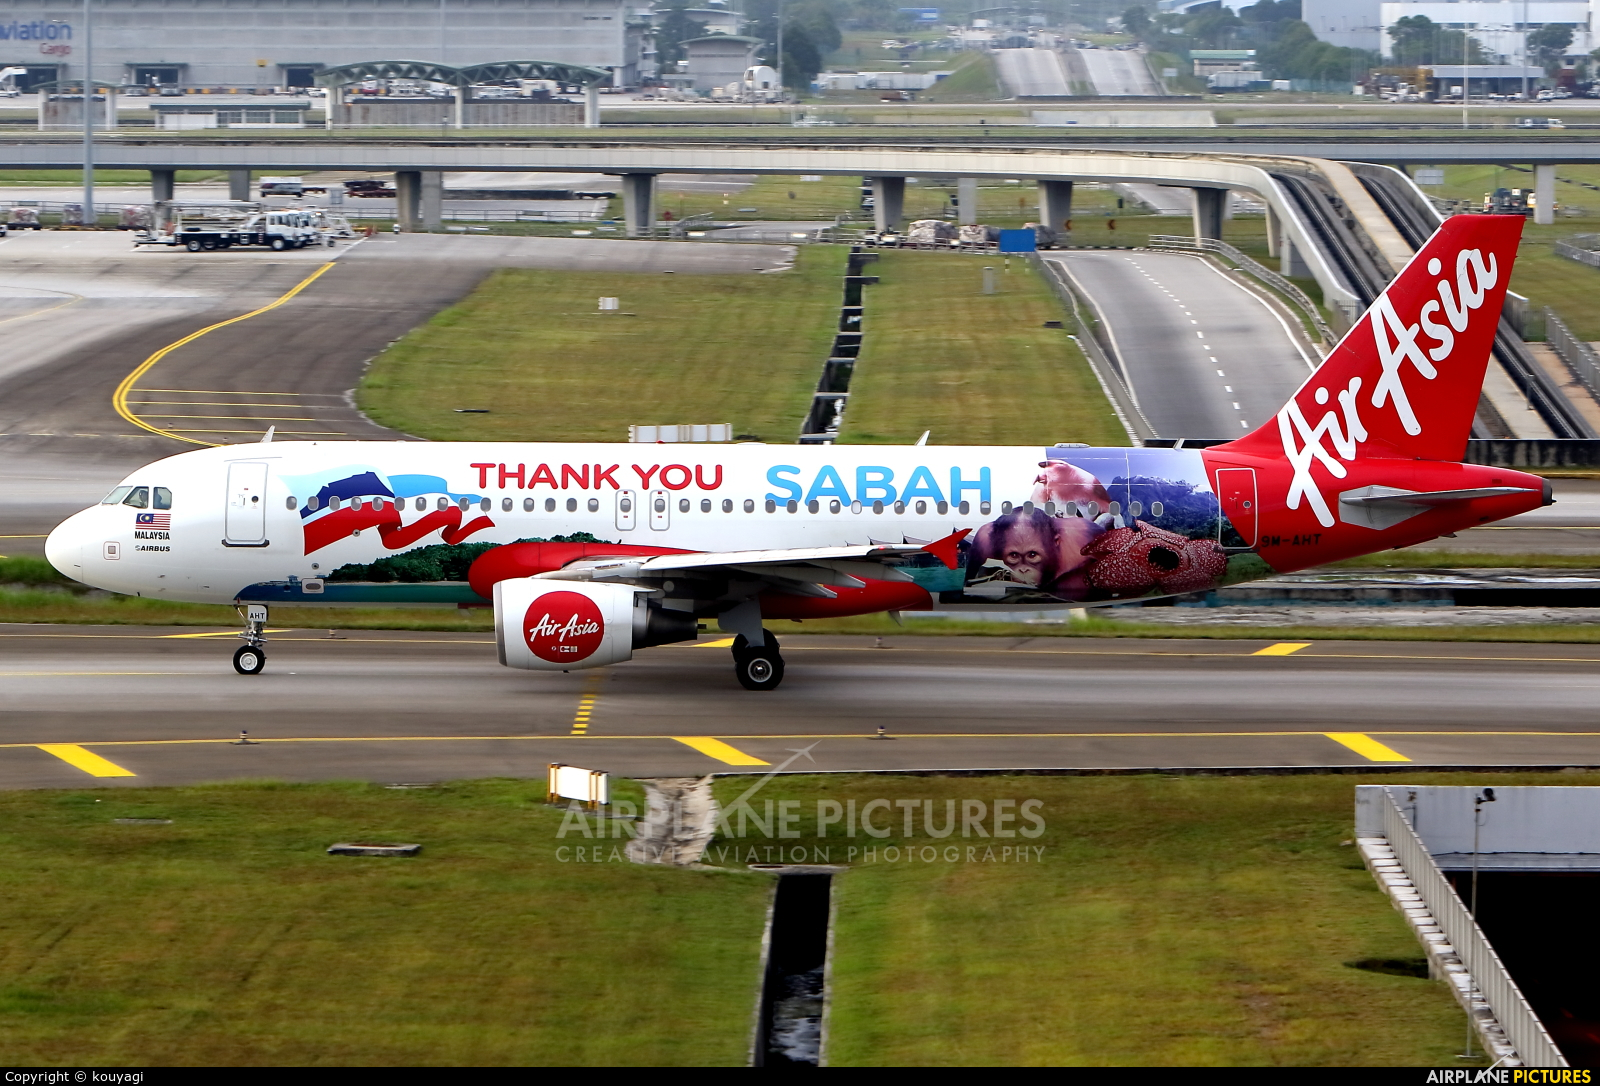 AirAsia (Malaysia) 9M-AHT aircraft at Kuala Lumpur Intl